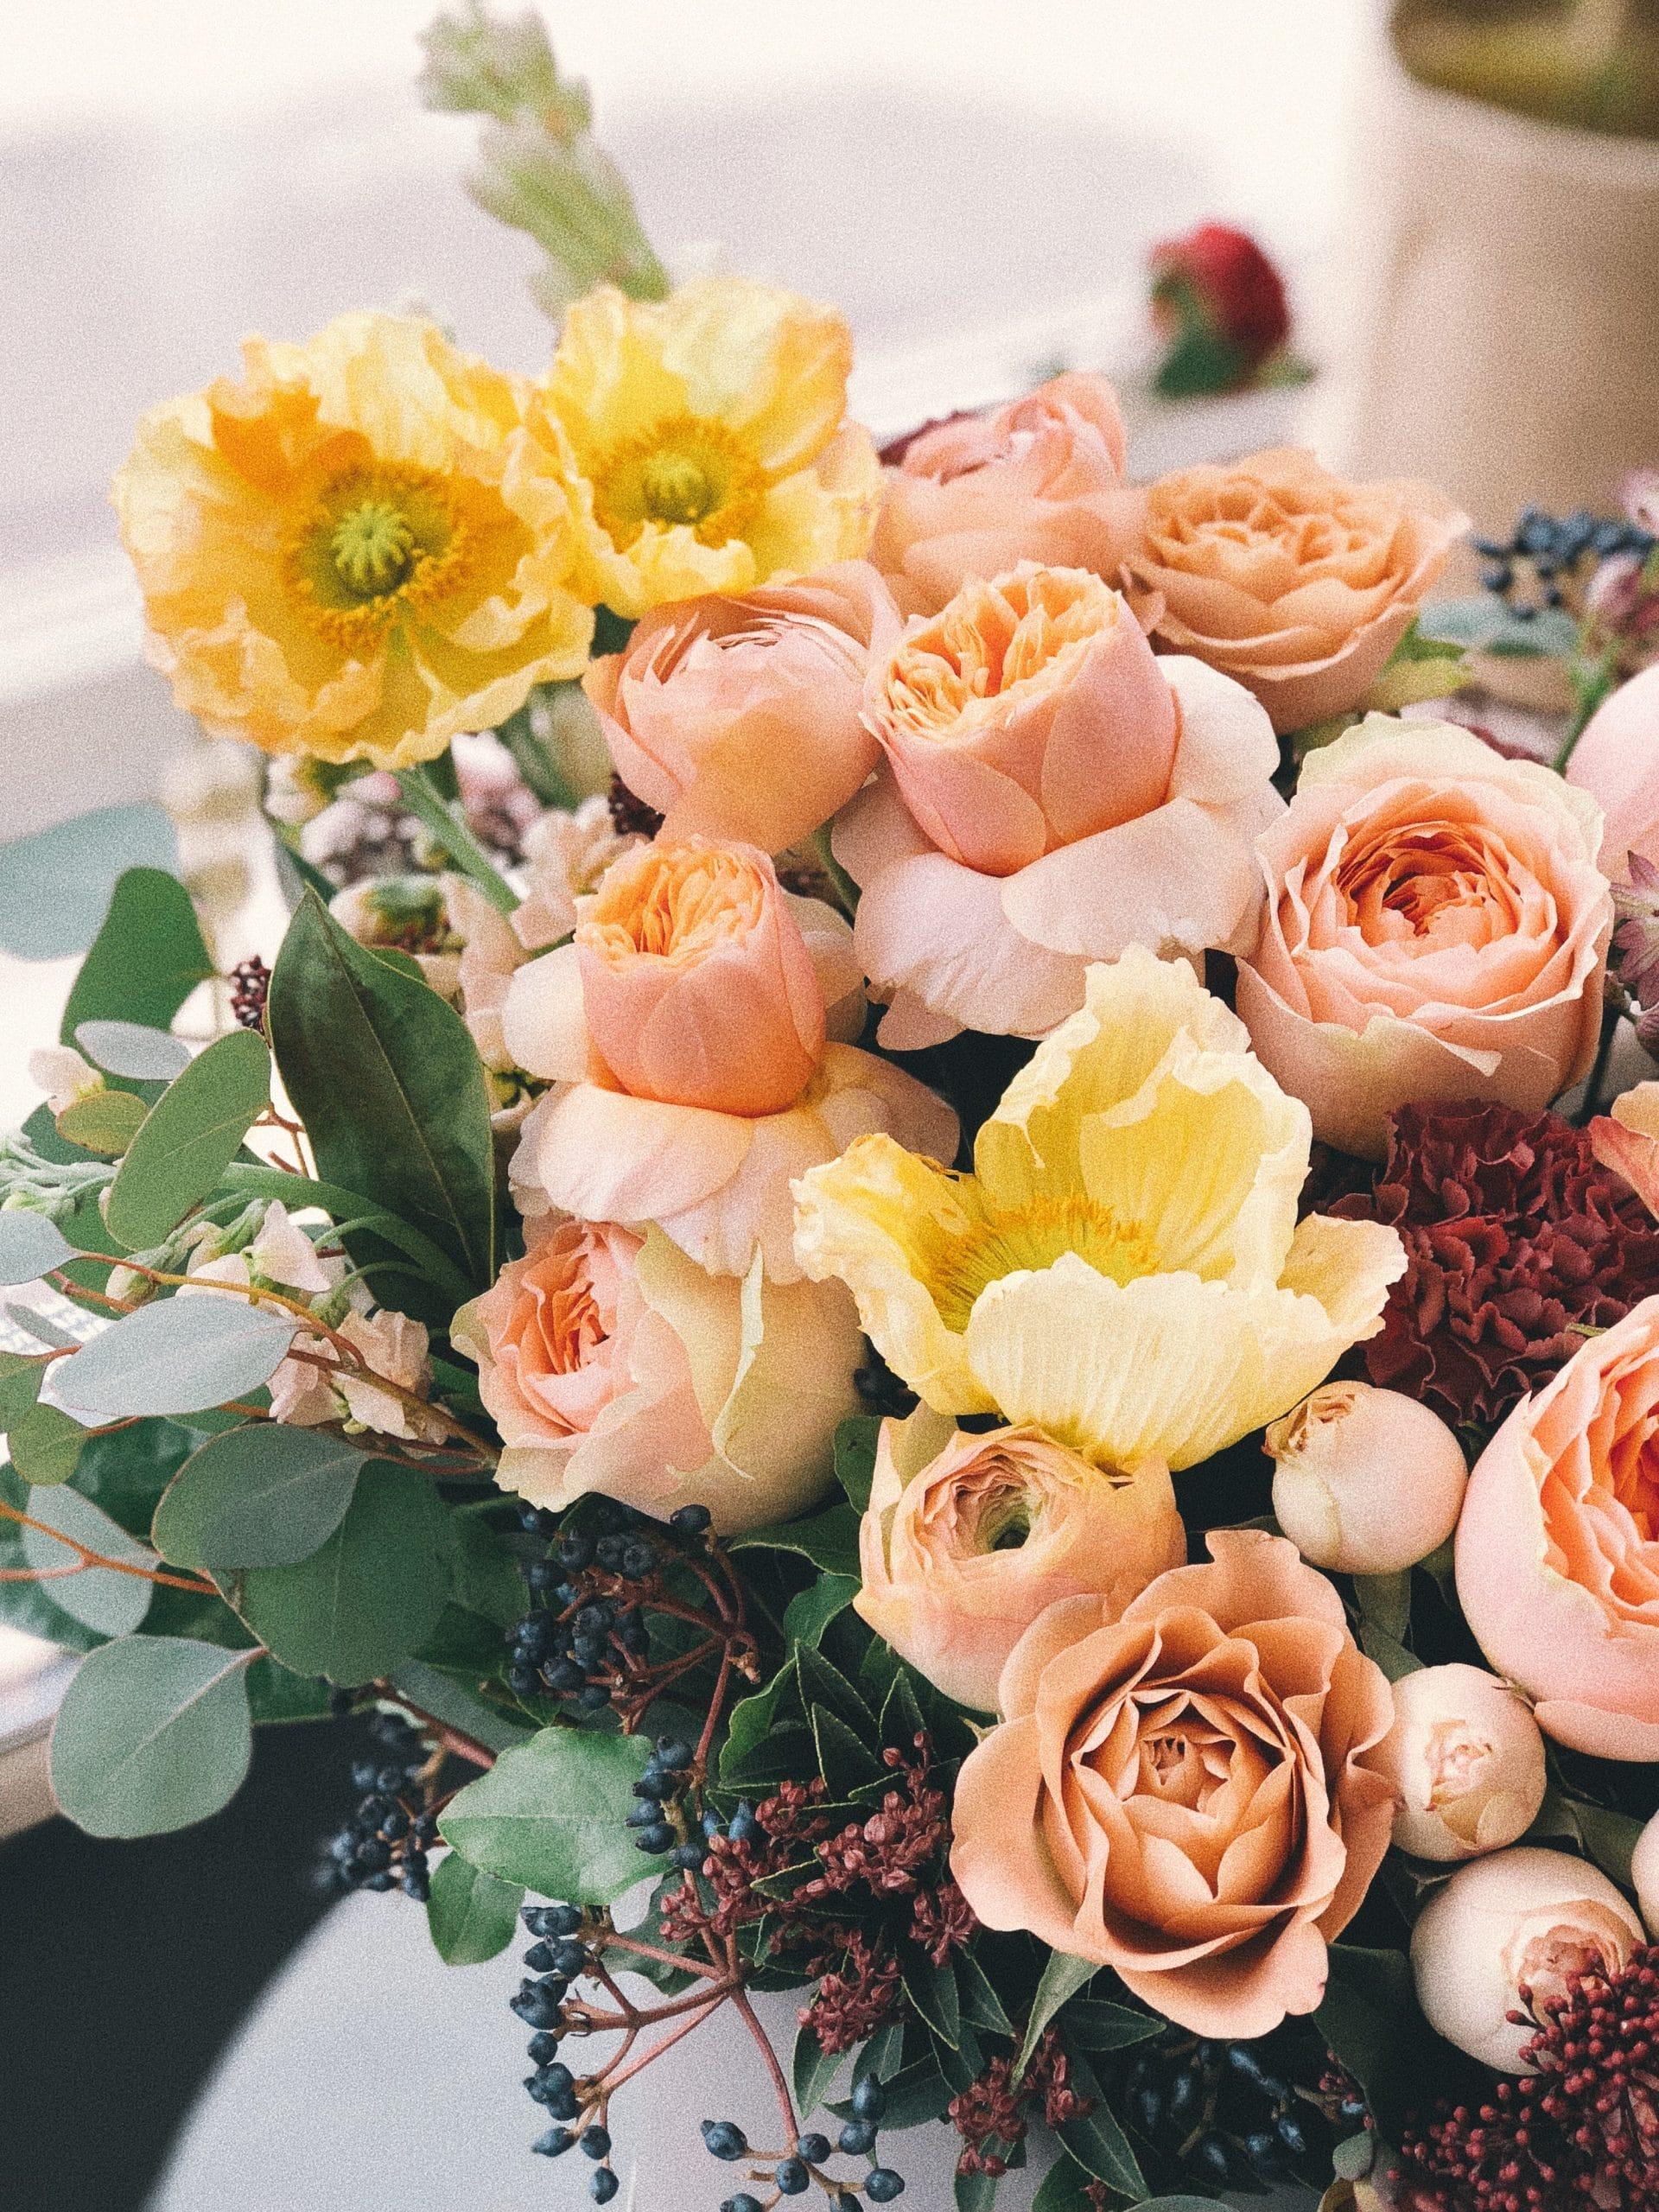 Plug and Pulse - Site fleuriste - bouquet jaune et beige